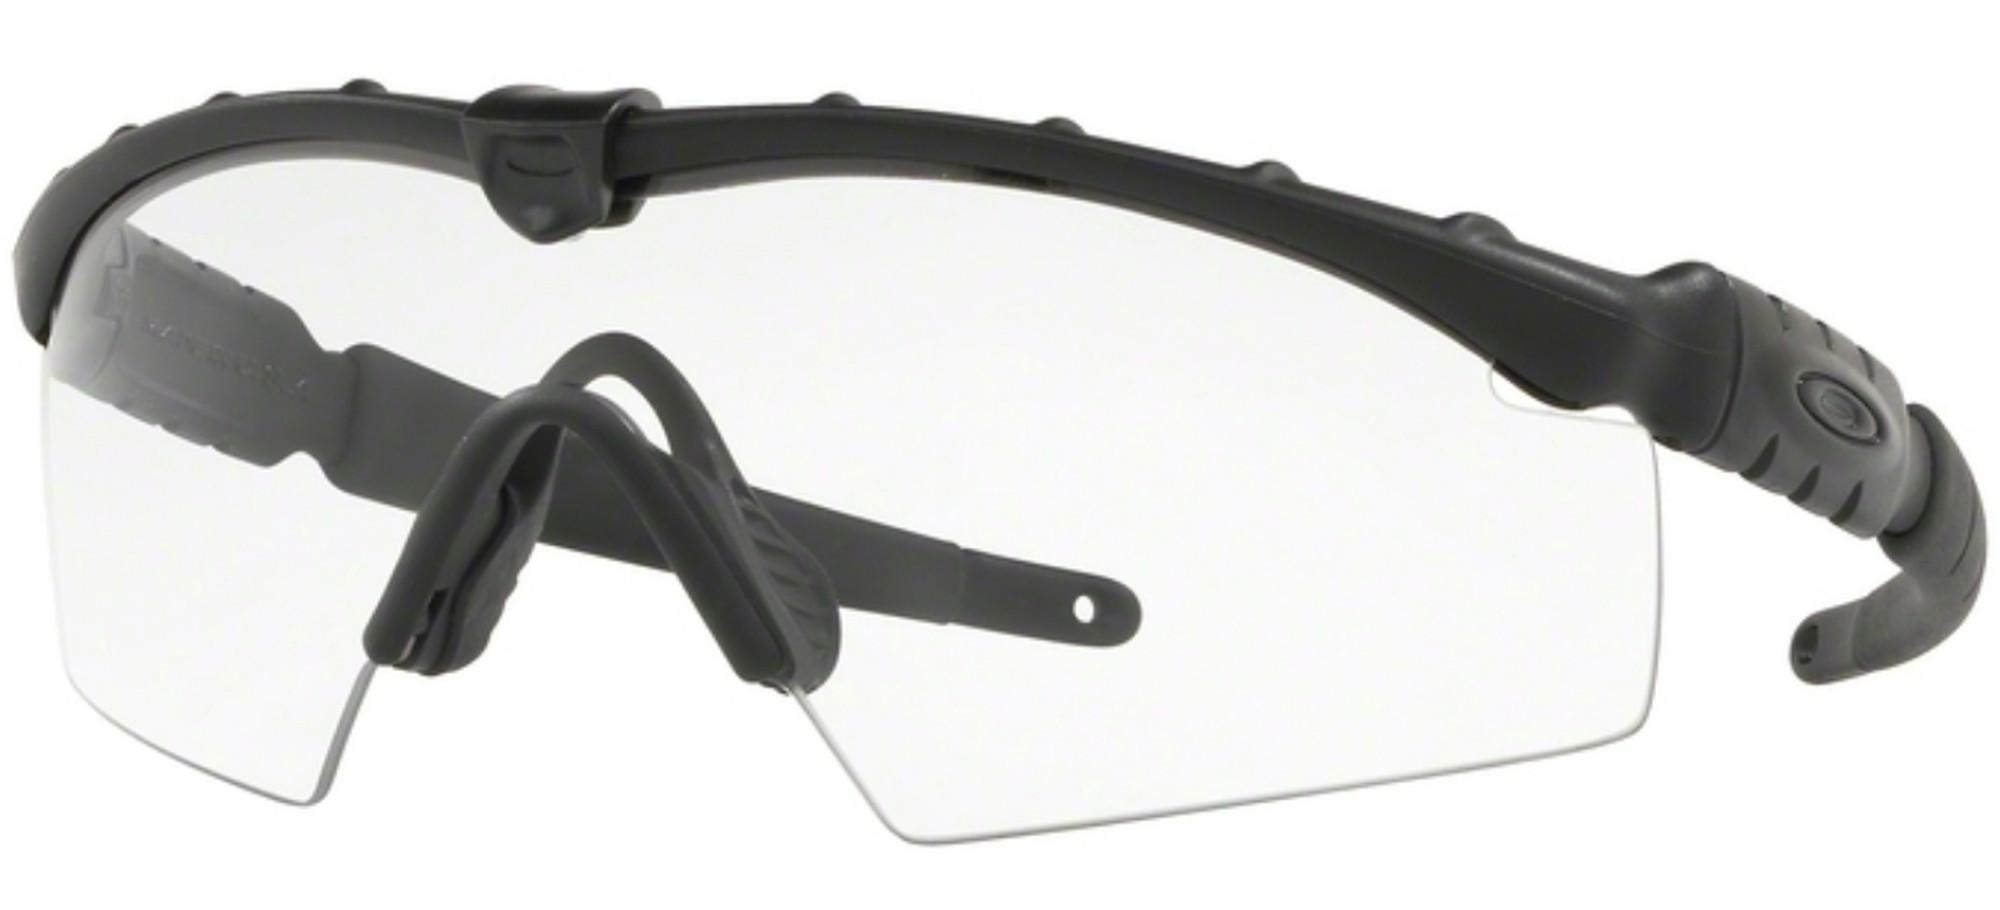 Oakley solbriller BALLISTIC M FRAME 2.0 OO 9213